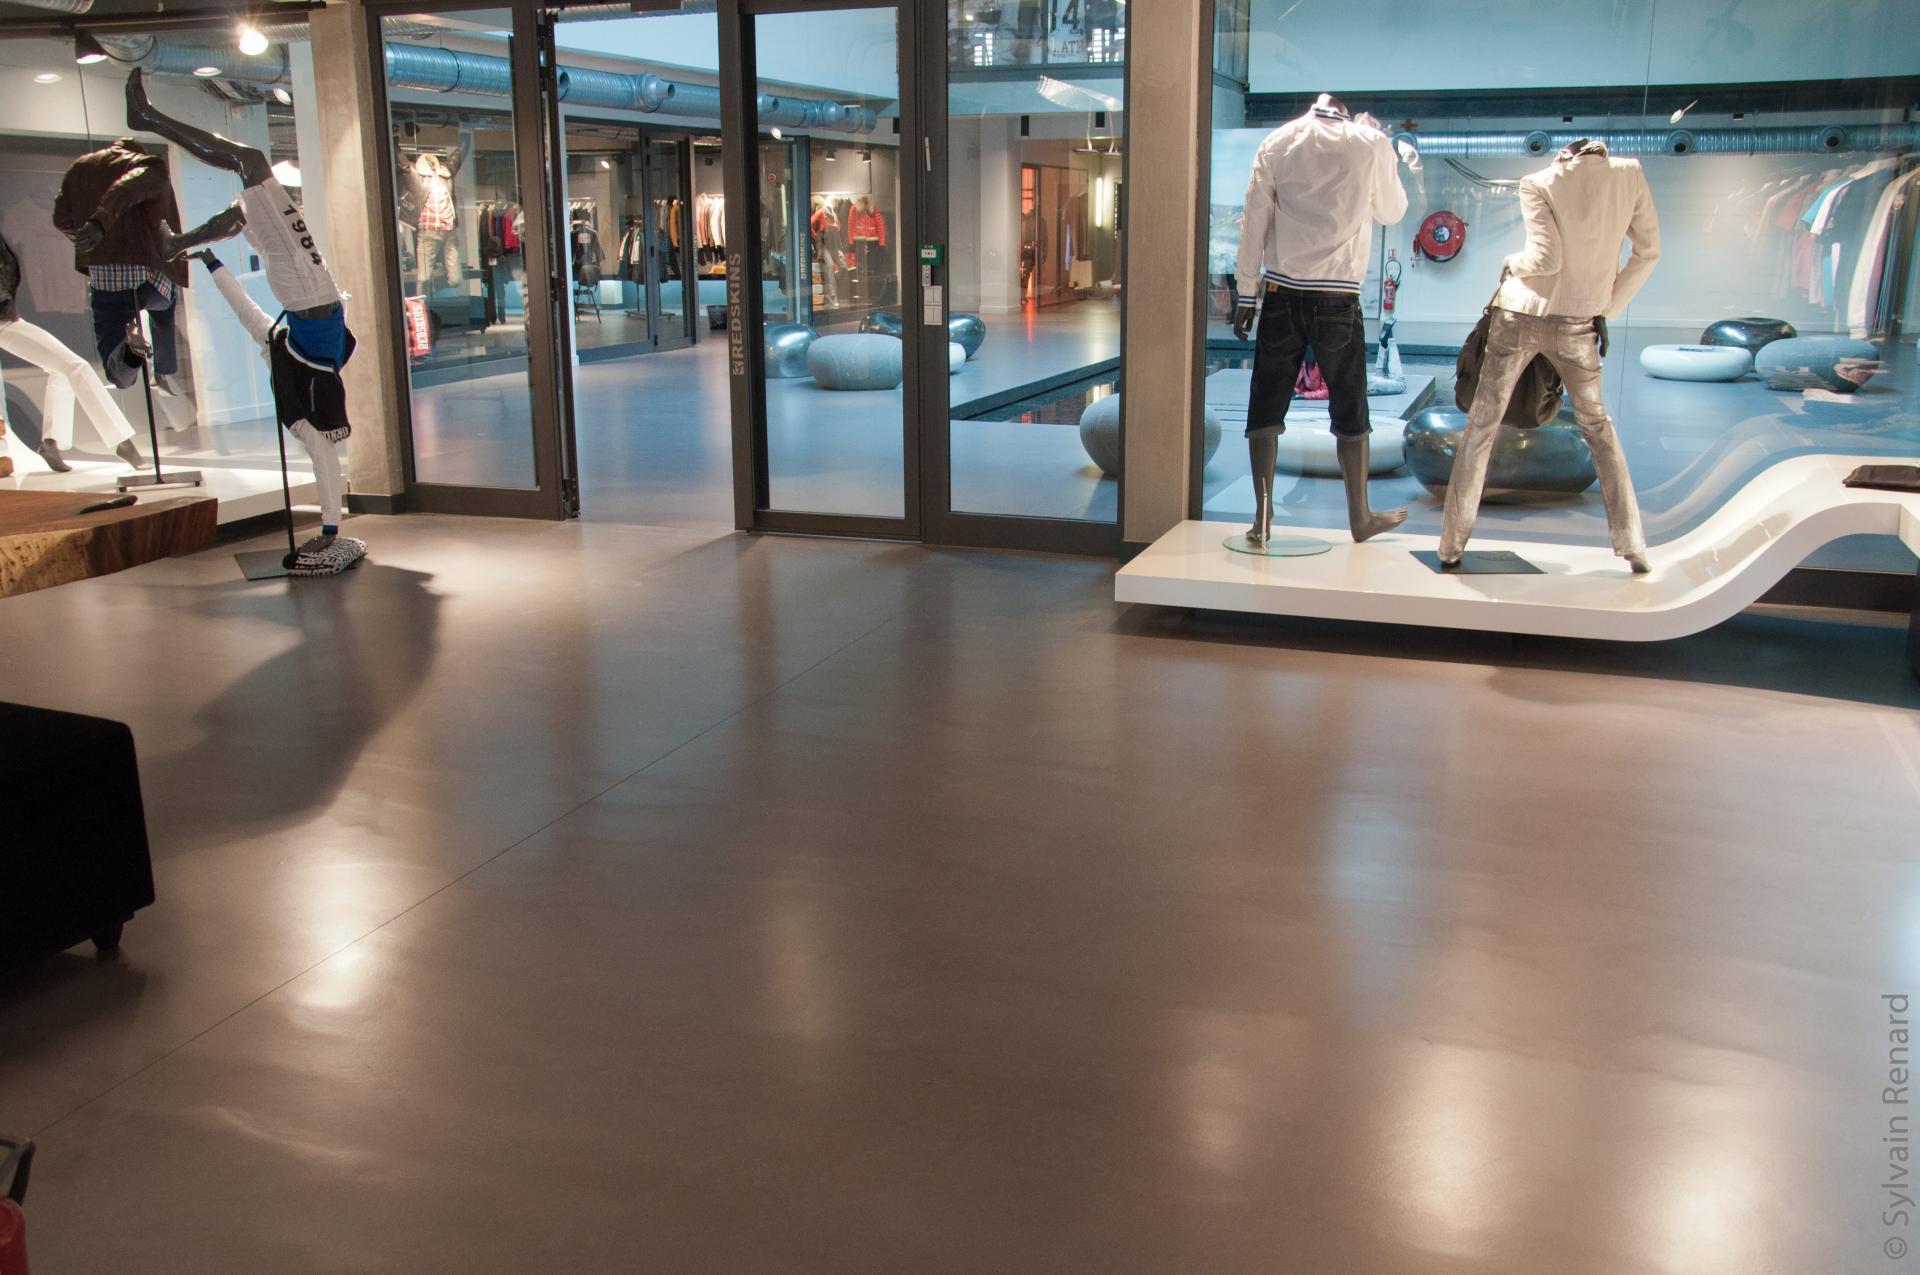 weber.floor design superfici armoniche